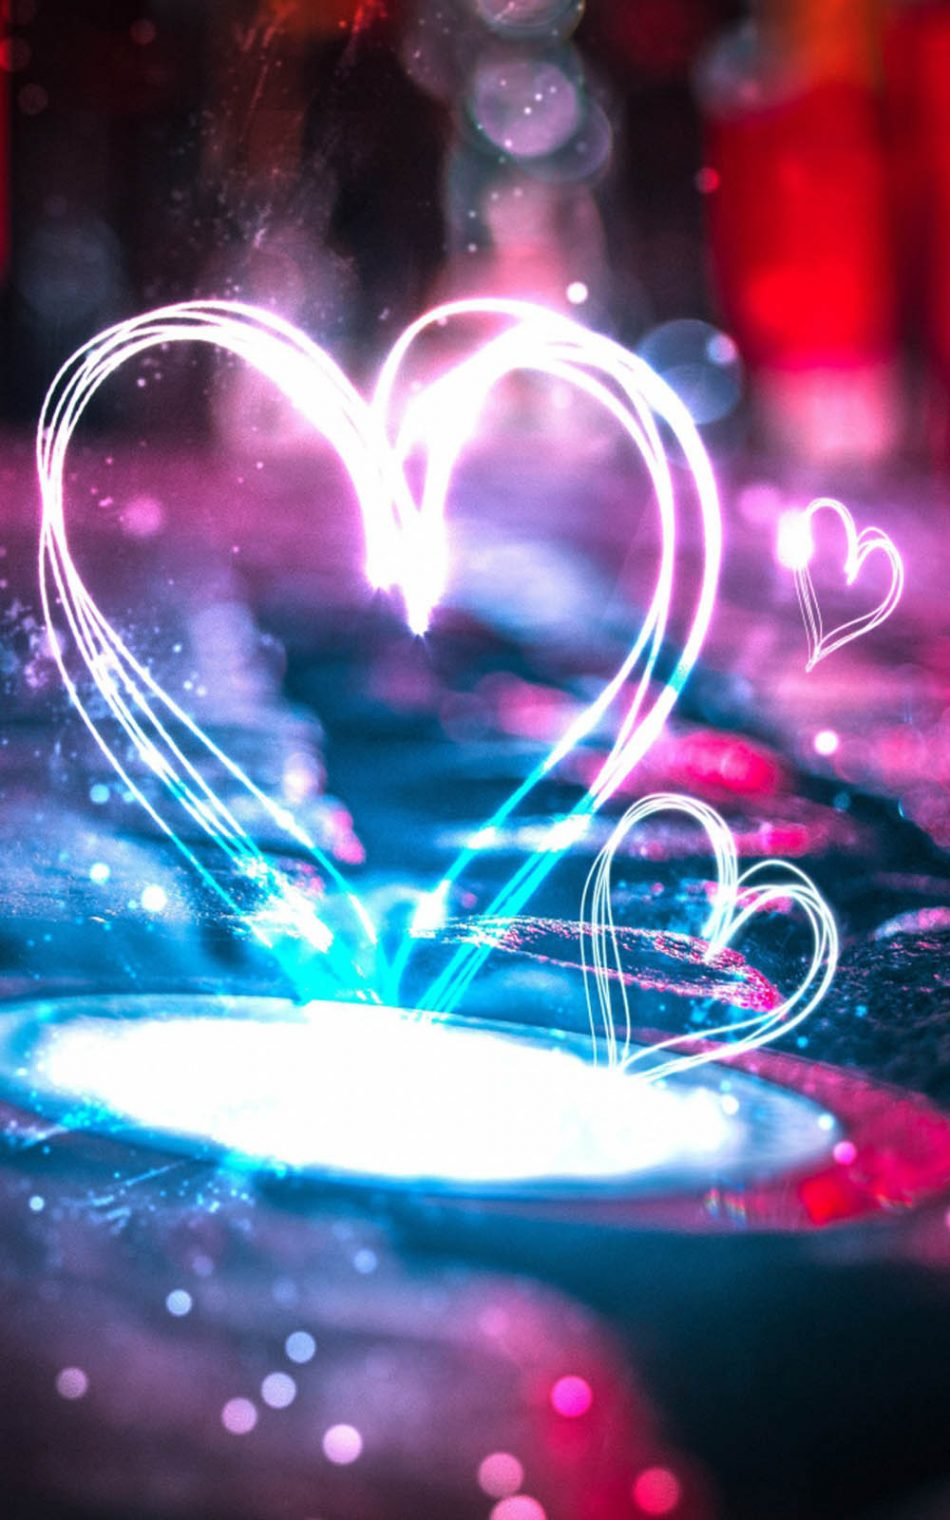 Download Heart Shape Lights Pure 4K Ultra HD Mobile Wallpaper 950x1520